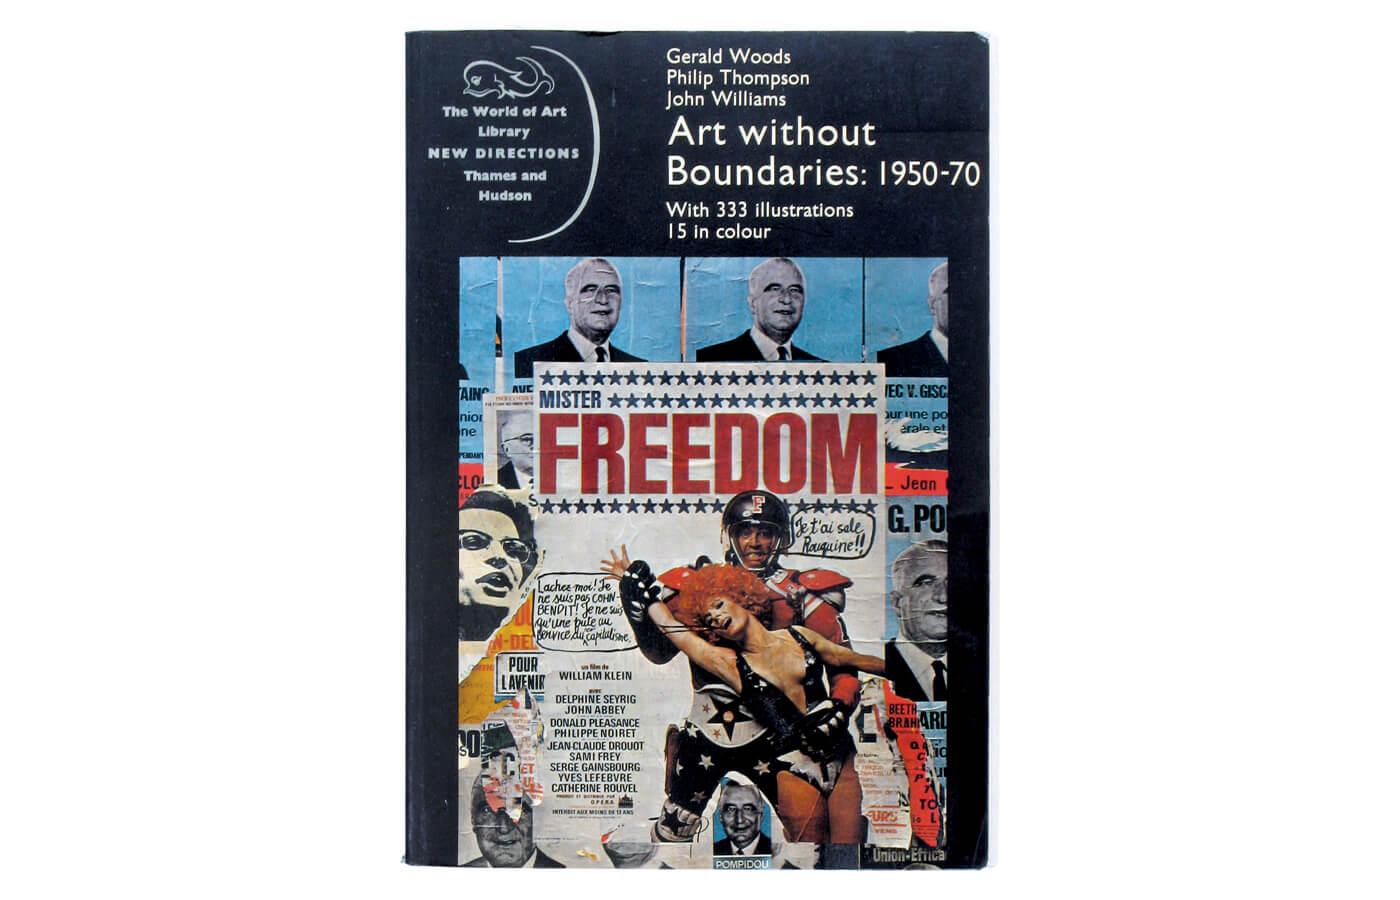 Art without Boundaries: 1950-70